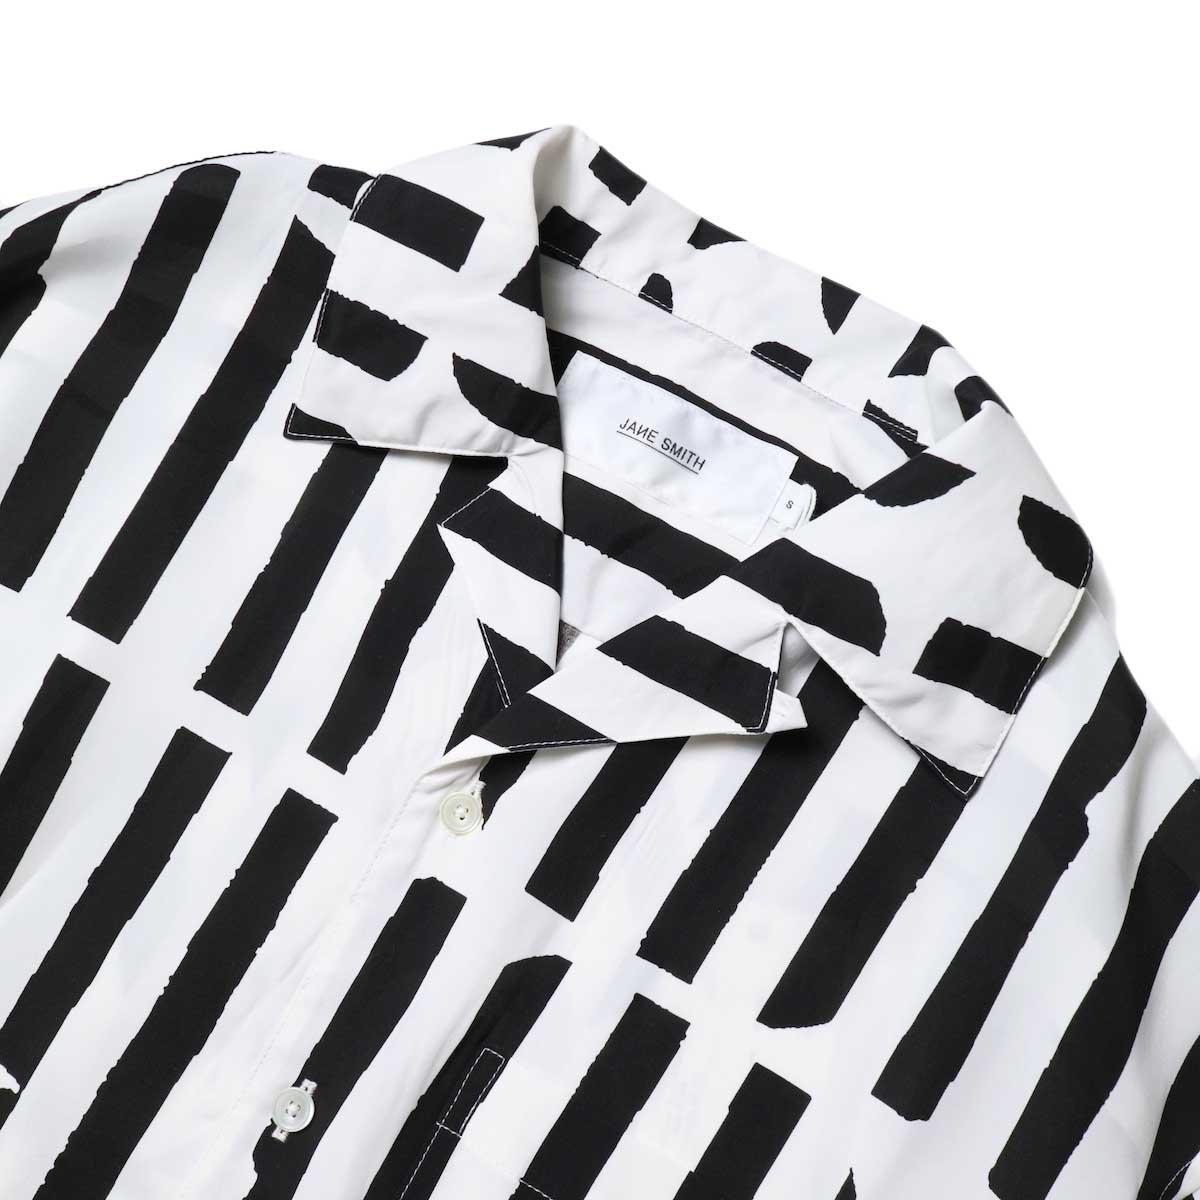 JANE SMITH / OPEN COLLAR SHIRTS S/S (White Black) フロントアップ